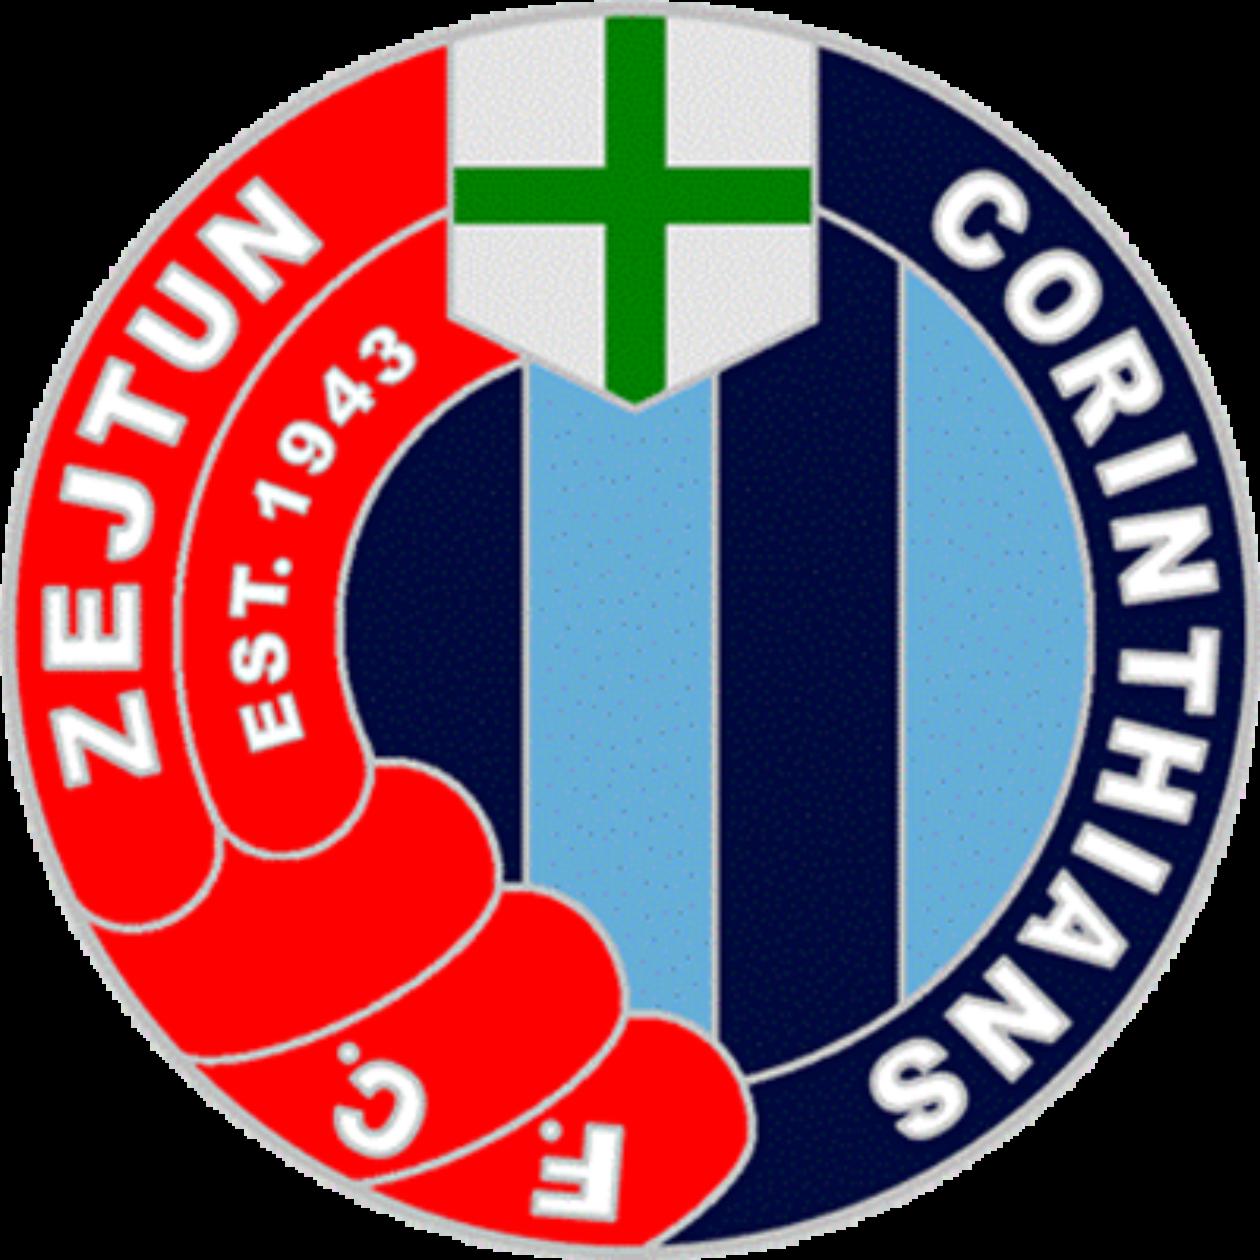 Corinthians fc result - Dent coin telegram 711